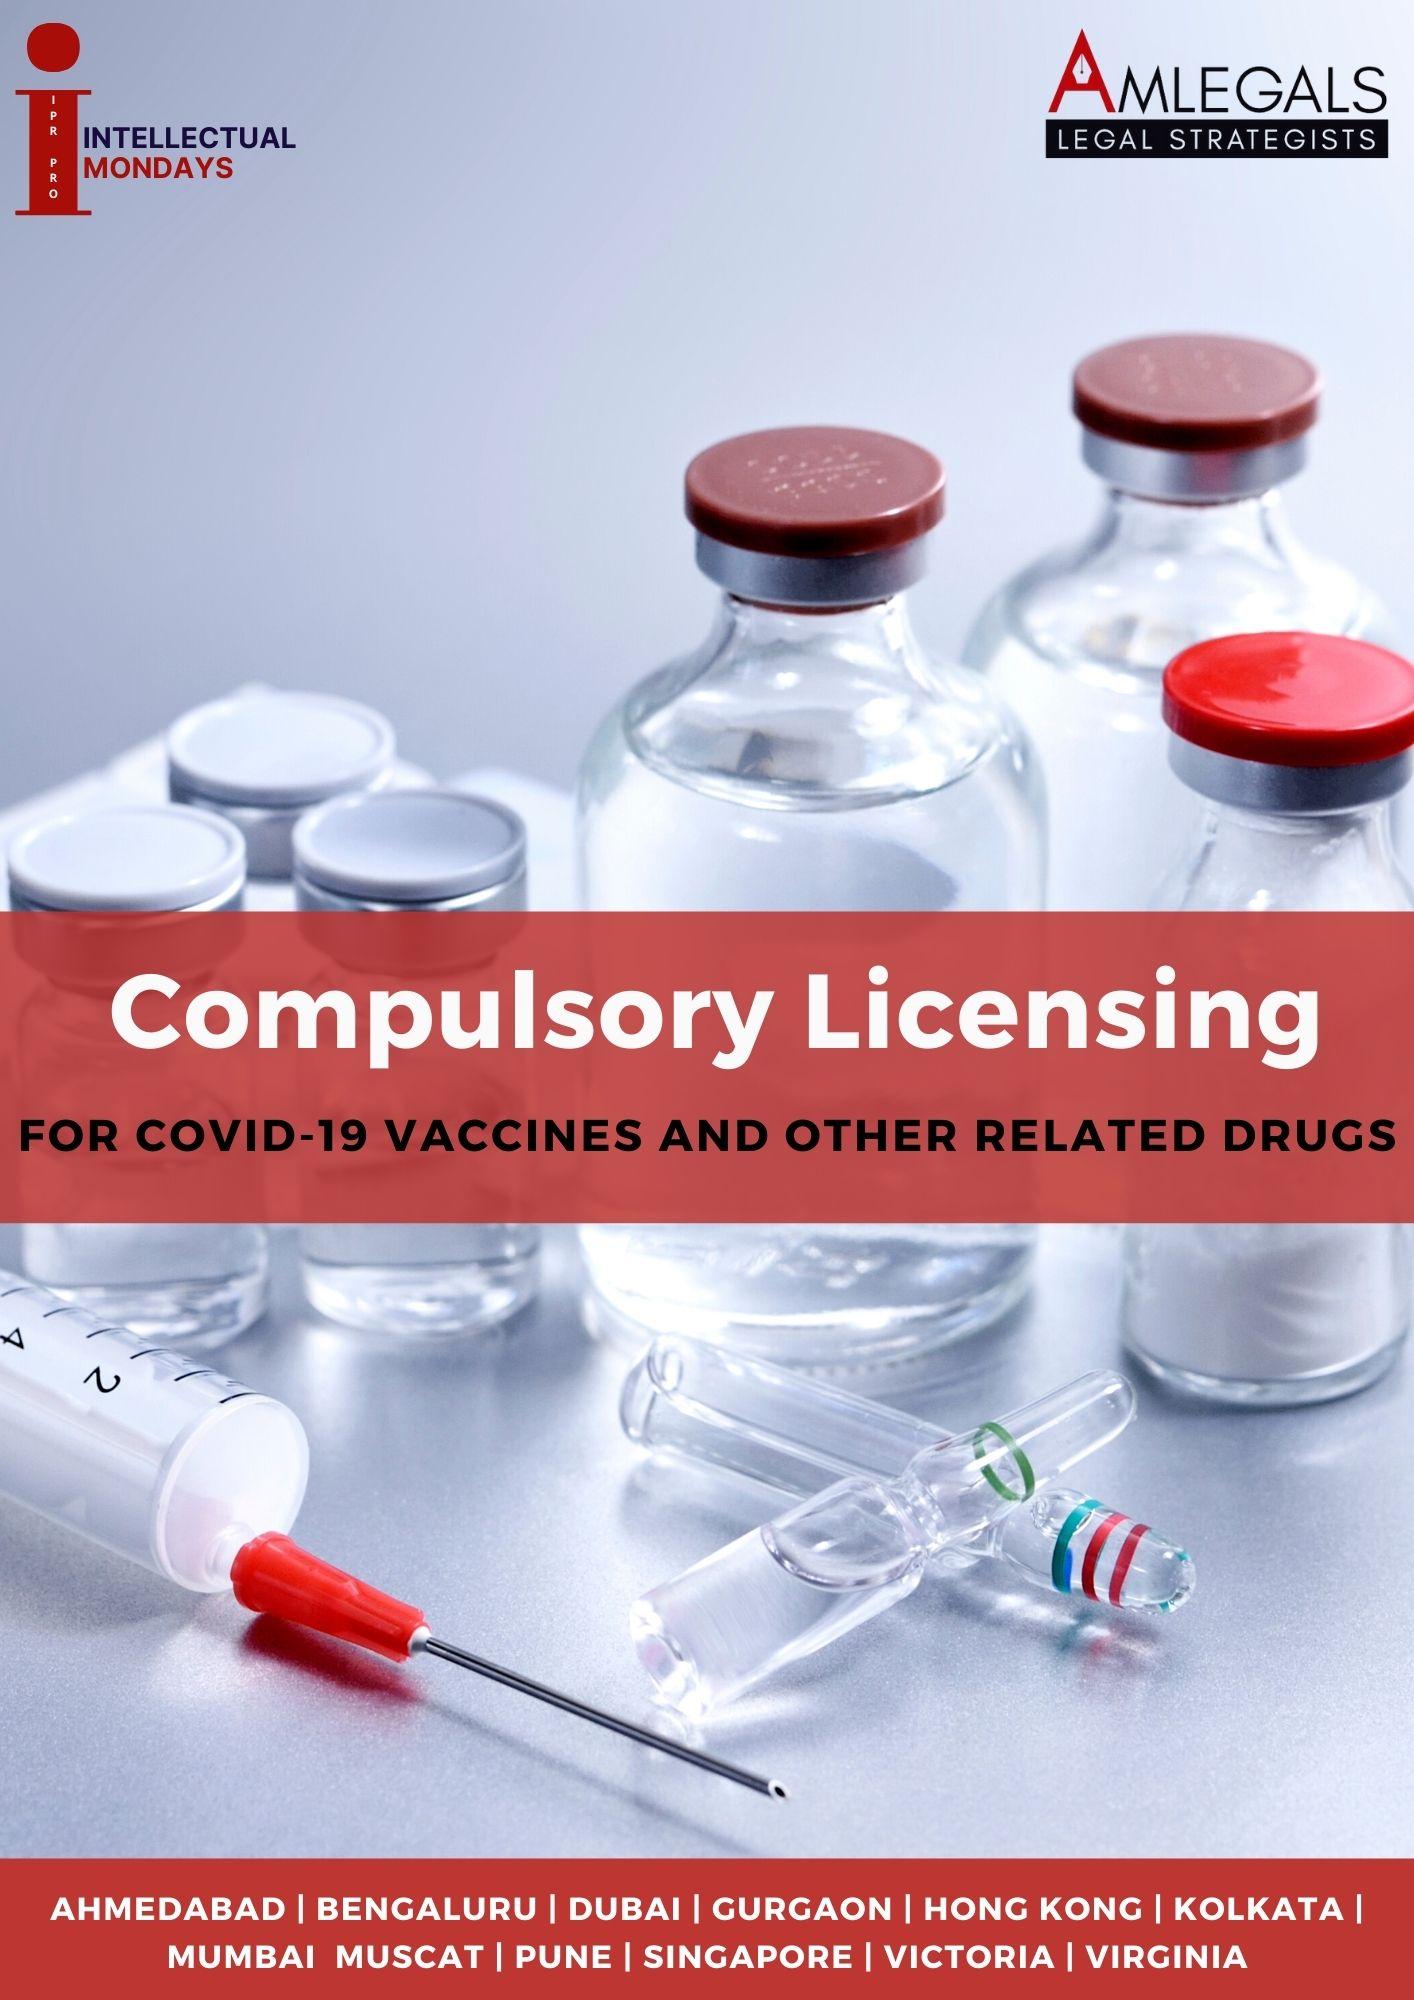 Compulsory Licensing